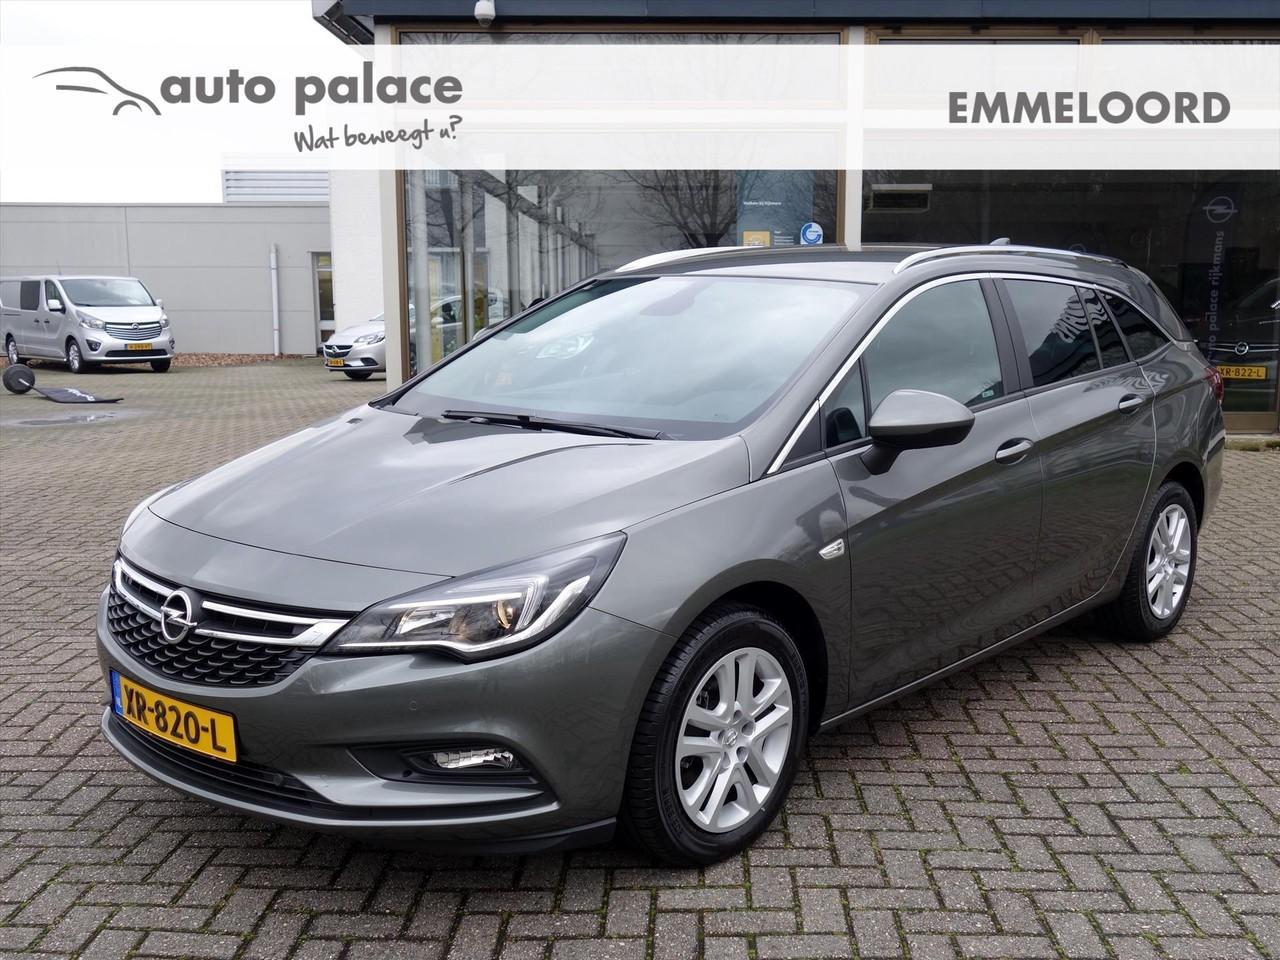 "Opel Astra Sports tourer 1.0 turbo 105pk online edition navi ecc parkpilot ""onstar"""